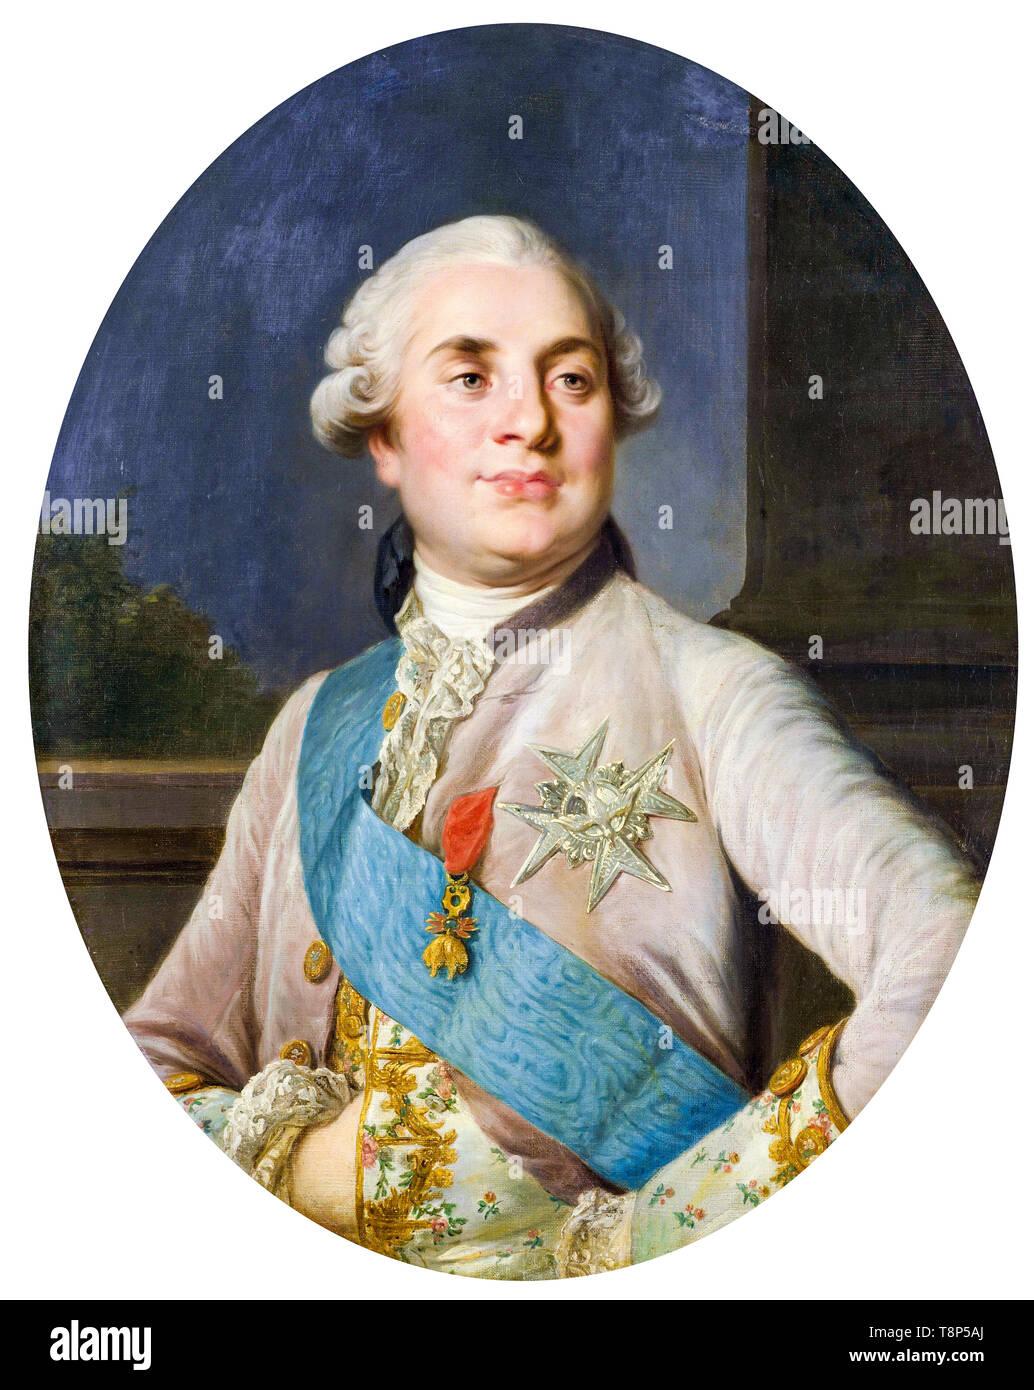 Portrait of Louis XVI, King of France, workshop of Joseph Siffrède Duplessis, c. 1777 - Stock Image